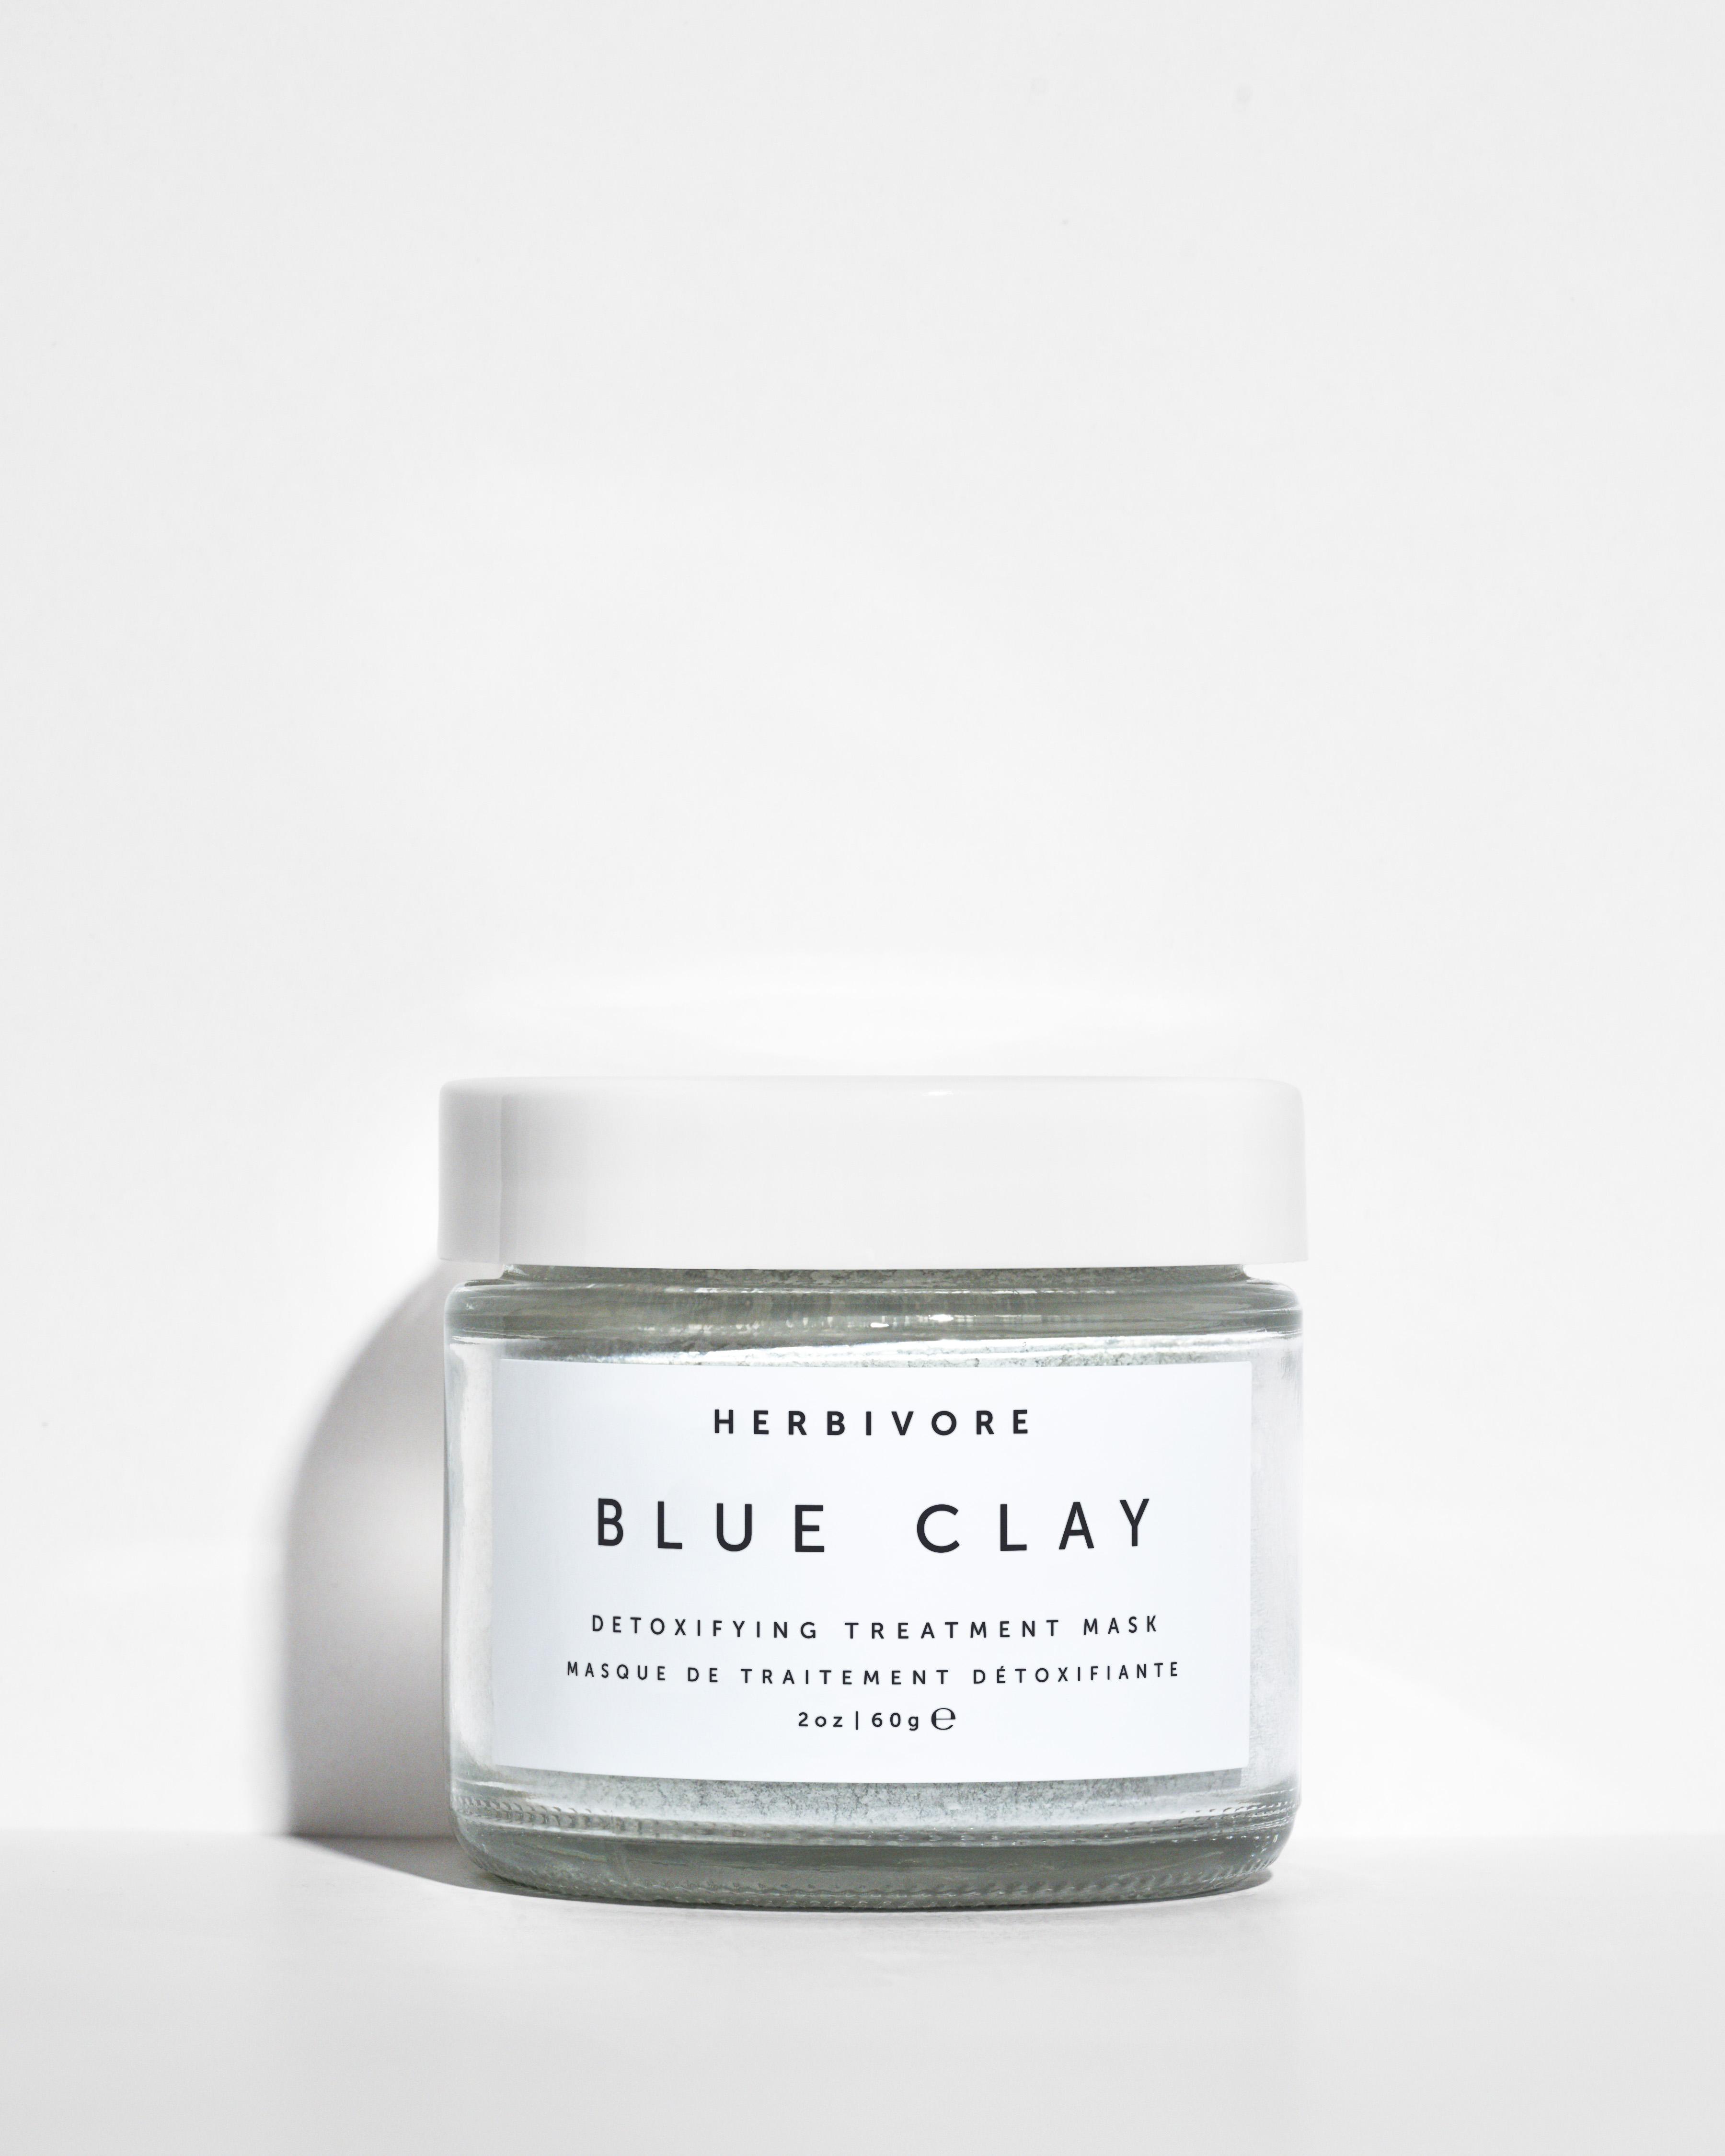 Herbivore Blue Clay Detoxifying Treatment Mask